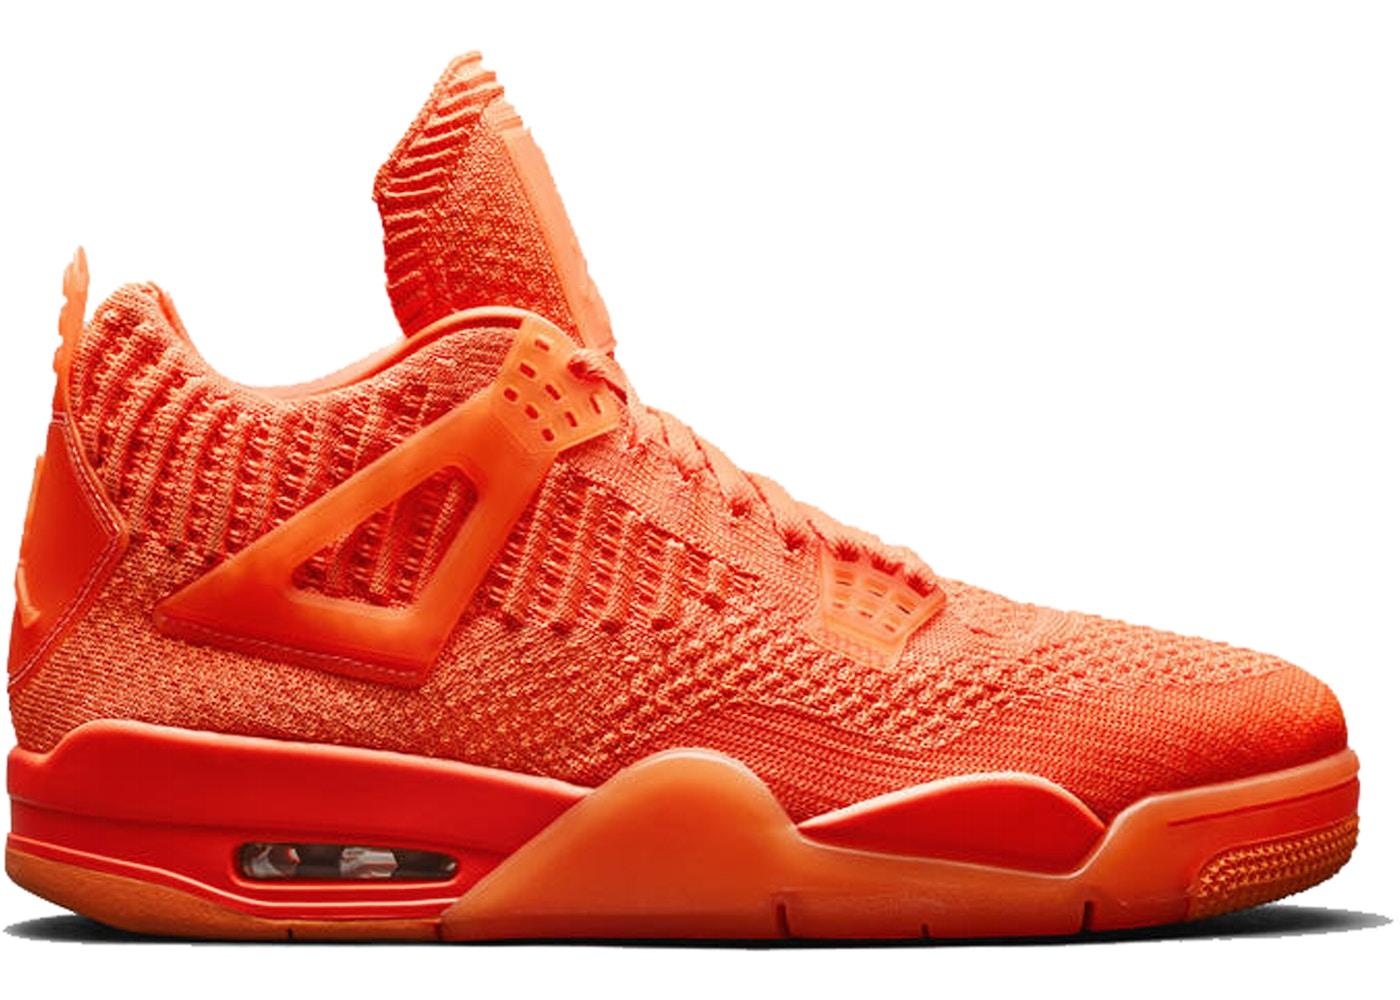 online store b136c 58928 Jordan 4 Retro Flyknit Orange - AQ3559-800